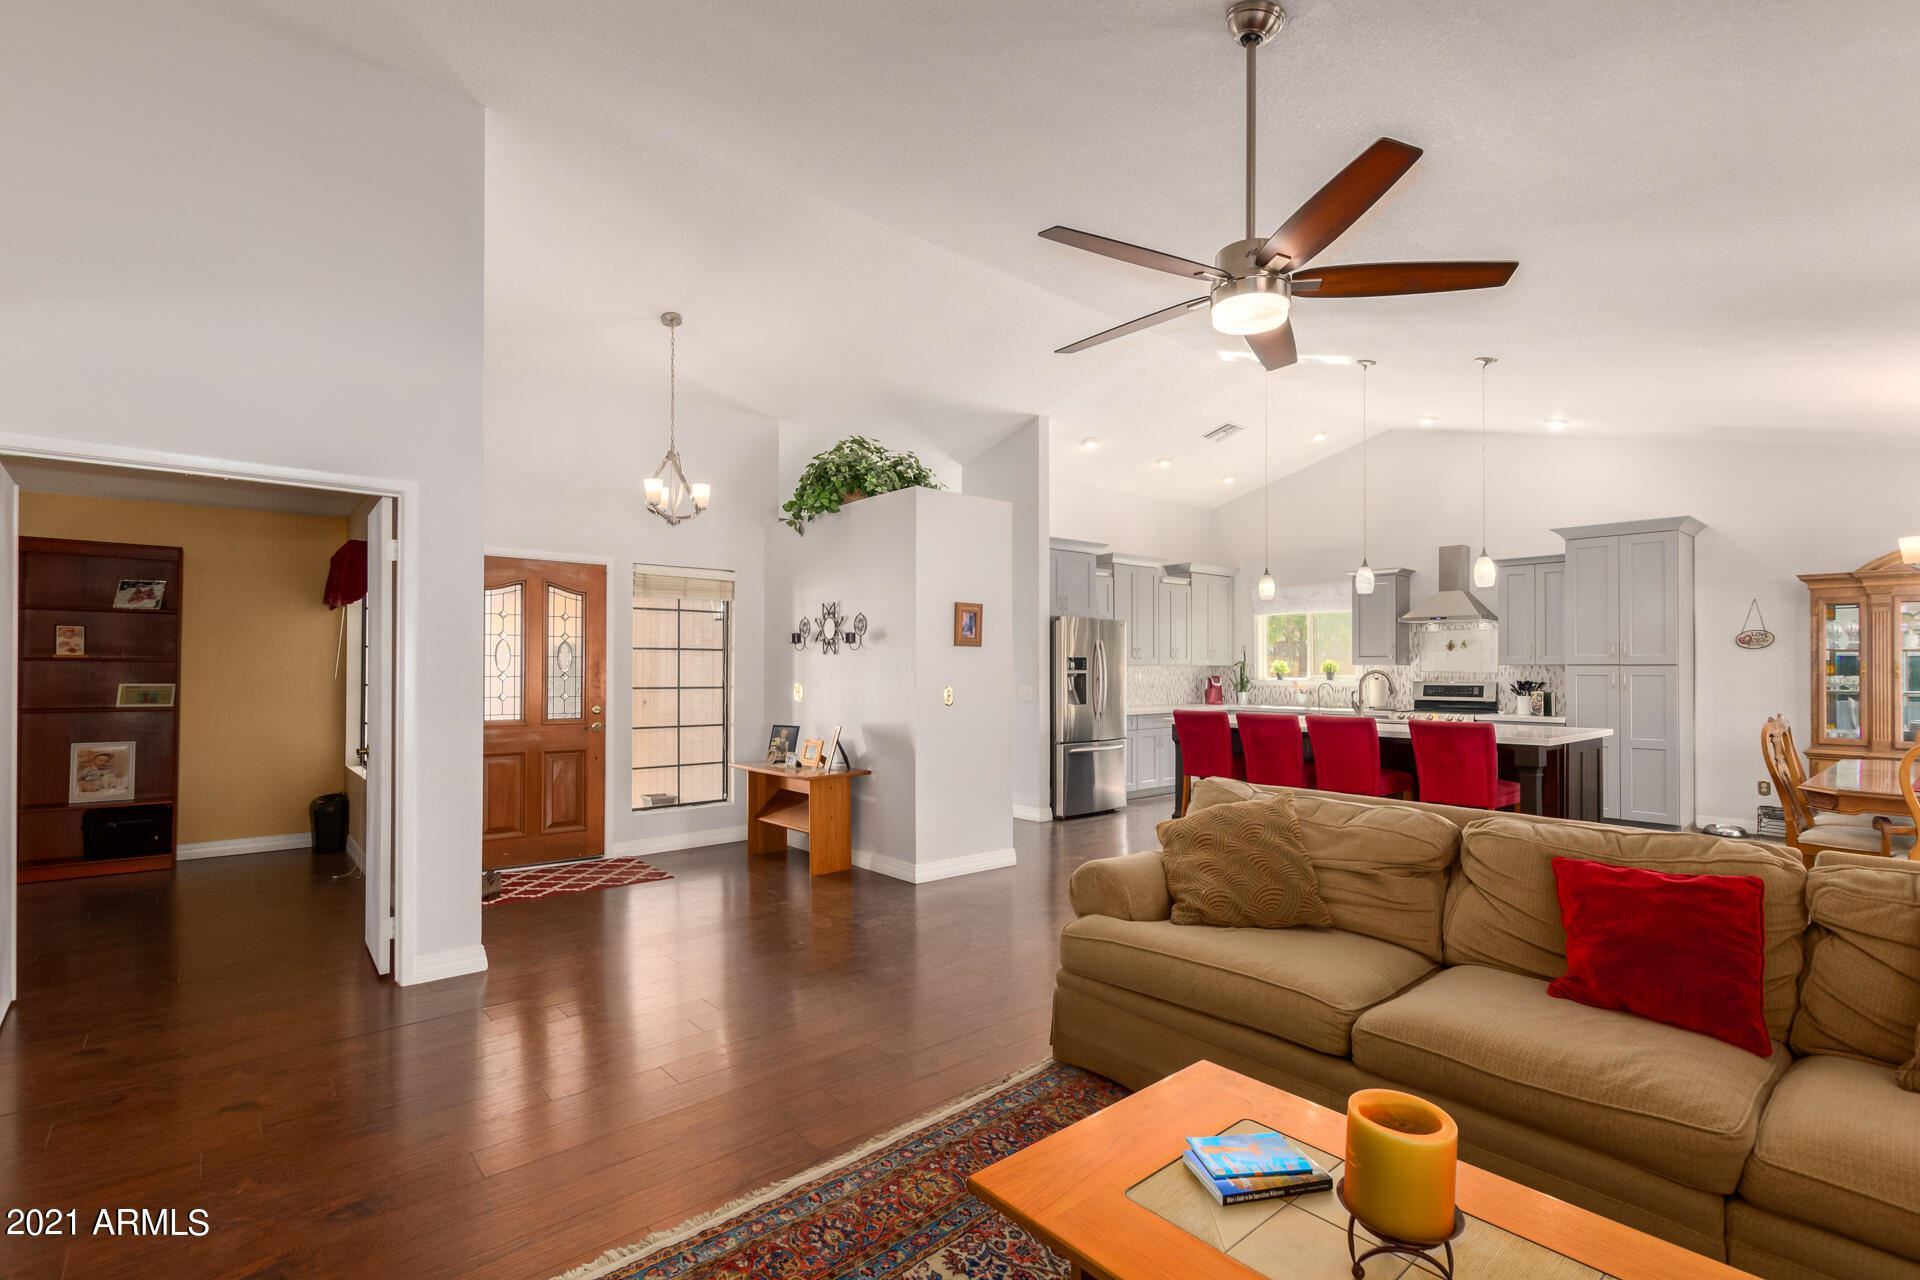 Photo of 1232 N KENNETH Place, Chandler, AZ 85226 (MLS # 6304981)